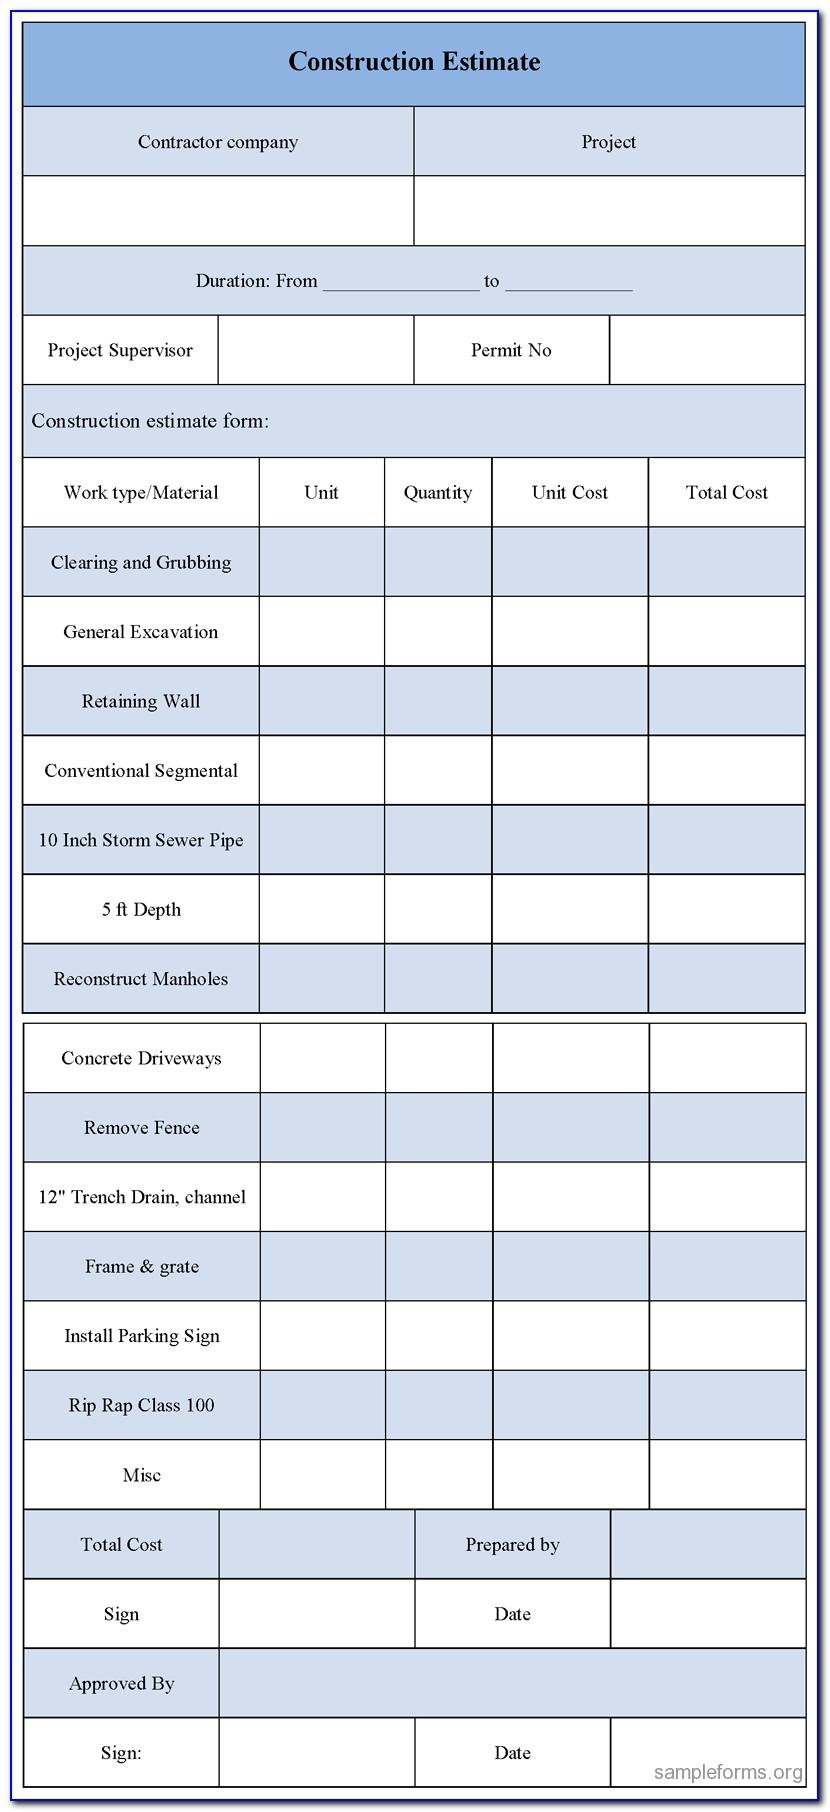 Construction Estimate Spreadsheet Template